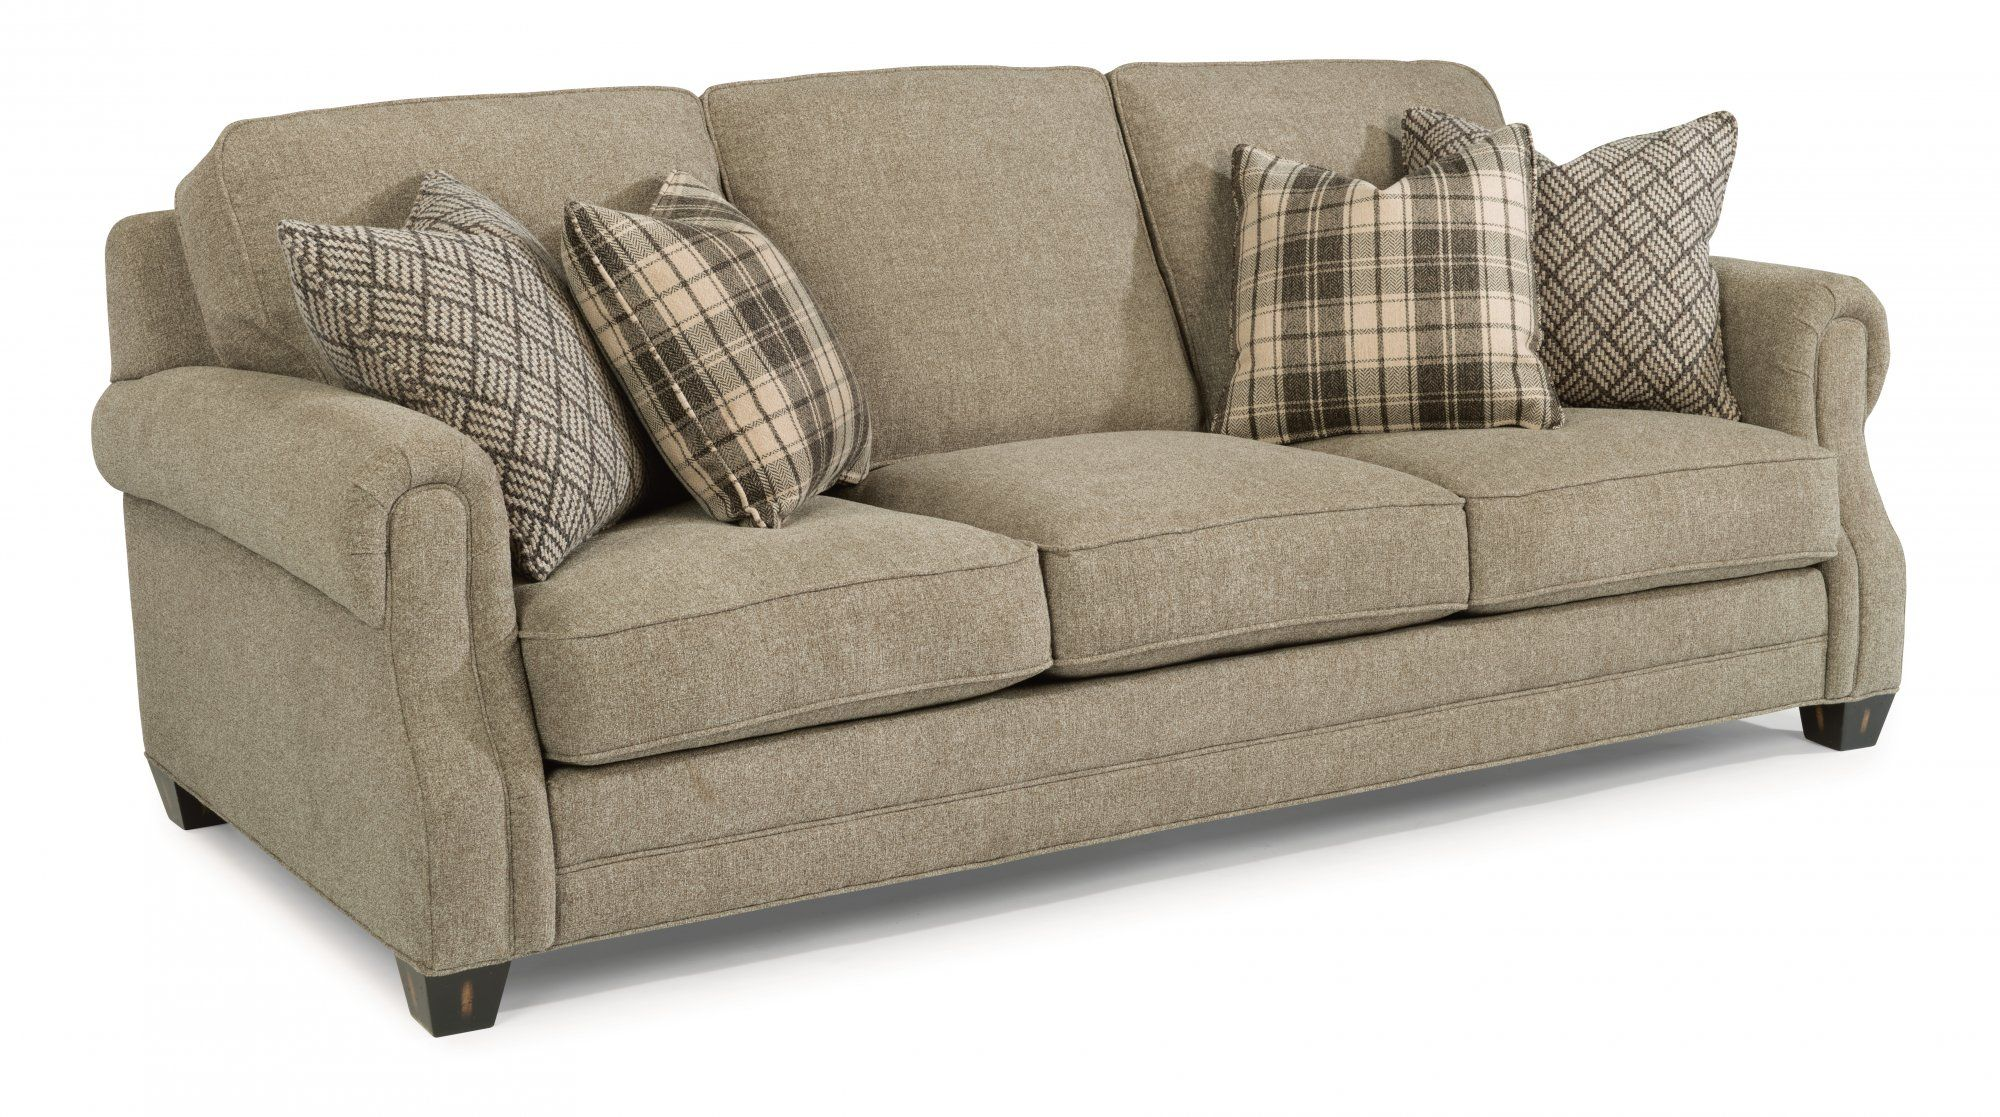 Flexsteel Winston Winston Sofa Jordan s Furniture